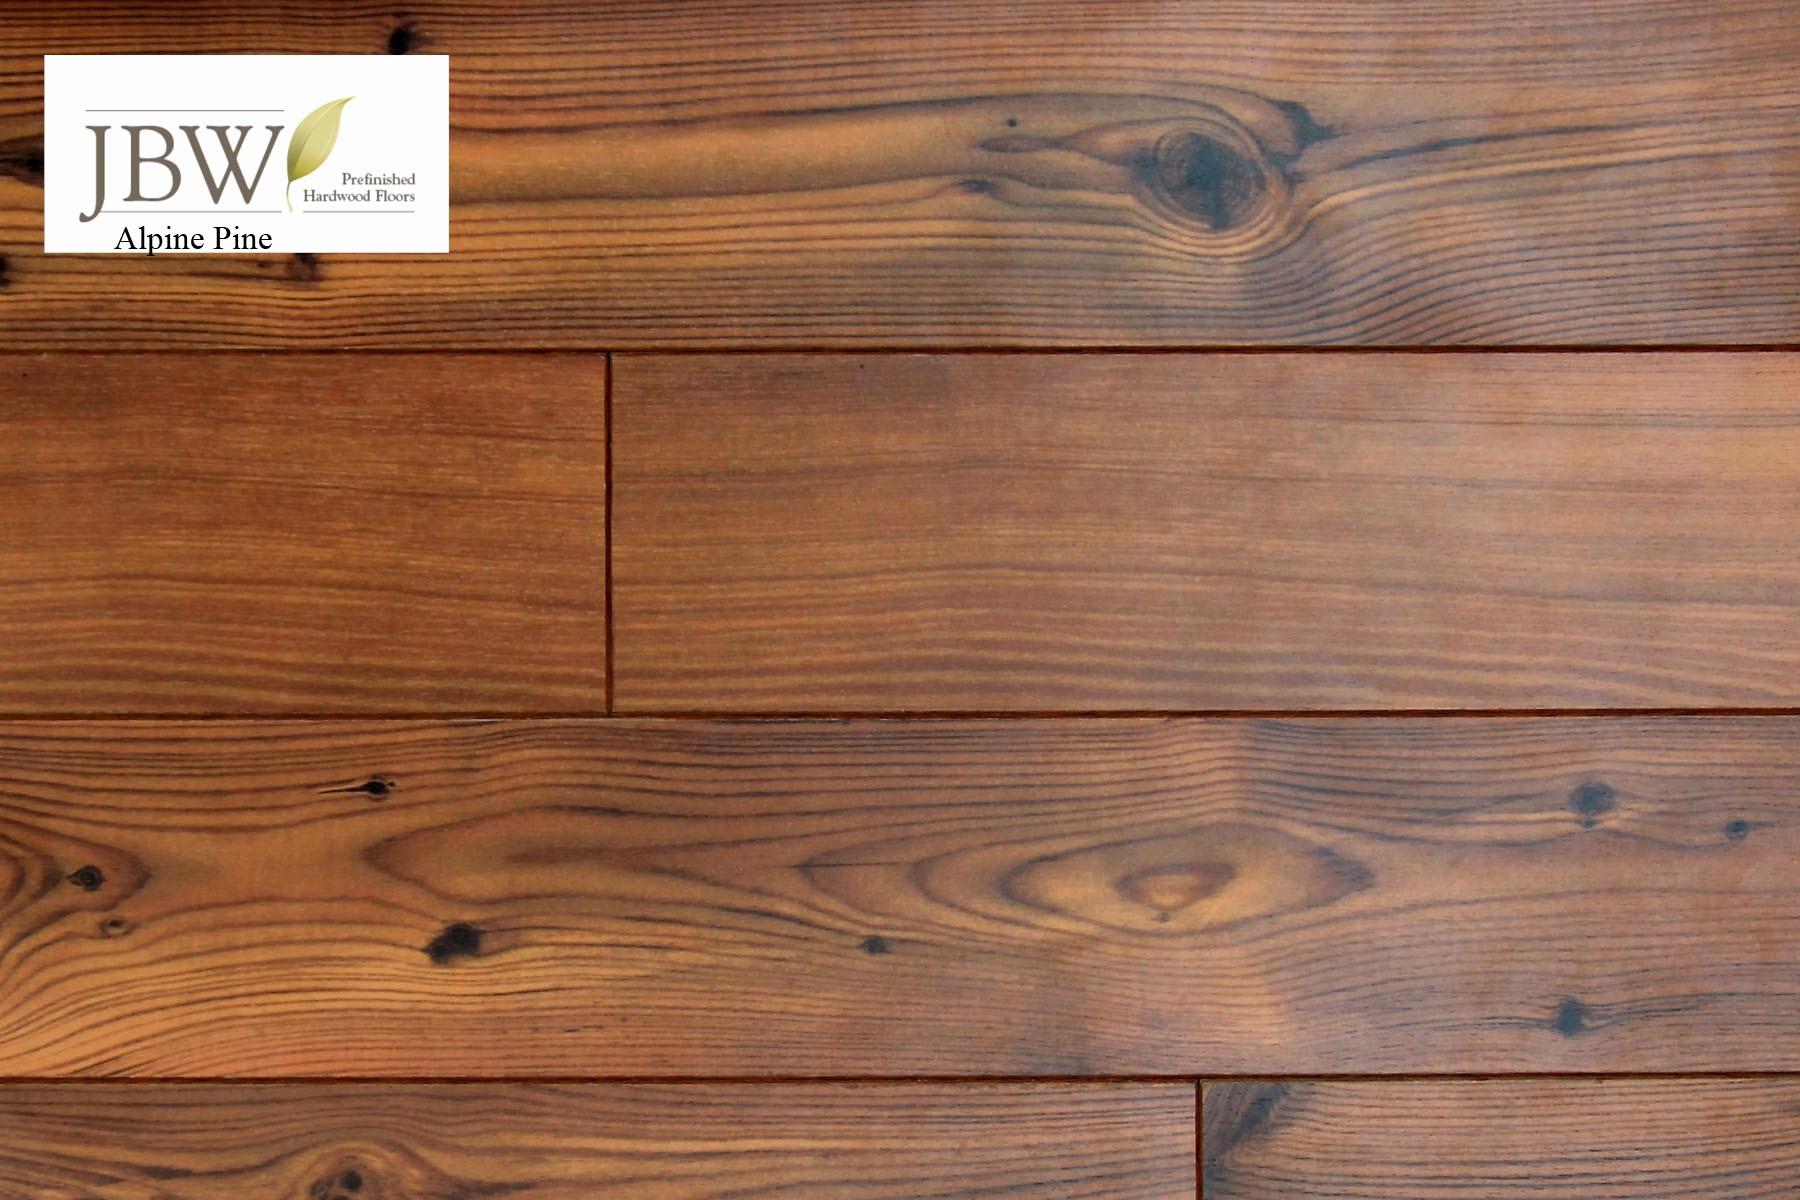 hardwood floor refinishing utah of 15 elegant how to install hardwood floors gallery dizpos com within how to install hardwood floors inspirational picture 18 of 50 hardwood flooring cost per sq ft